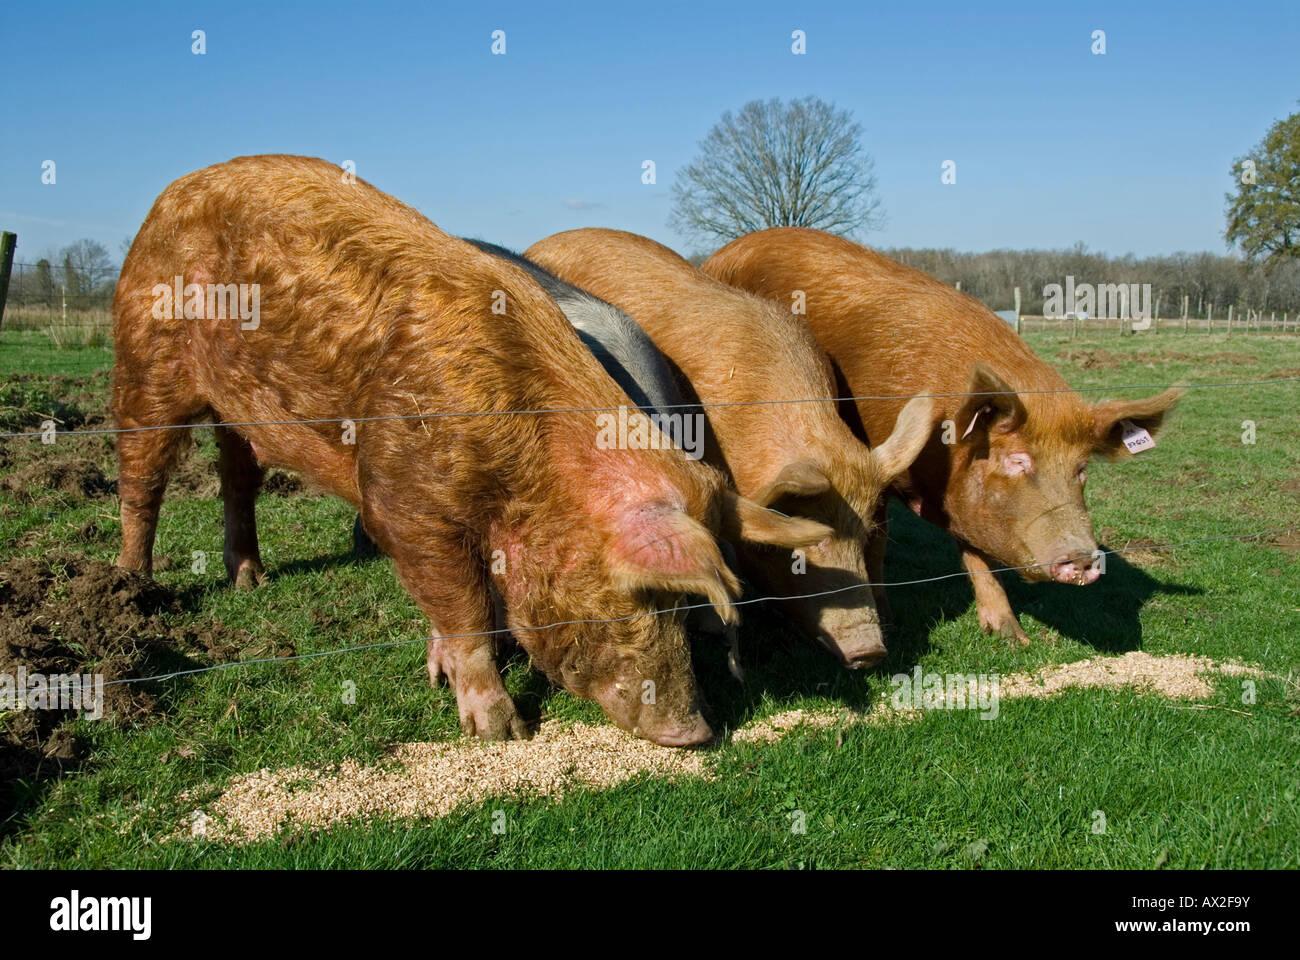 Stock Photo Of Three Tamworth Pigs Feeding On Corn The Photo